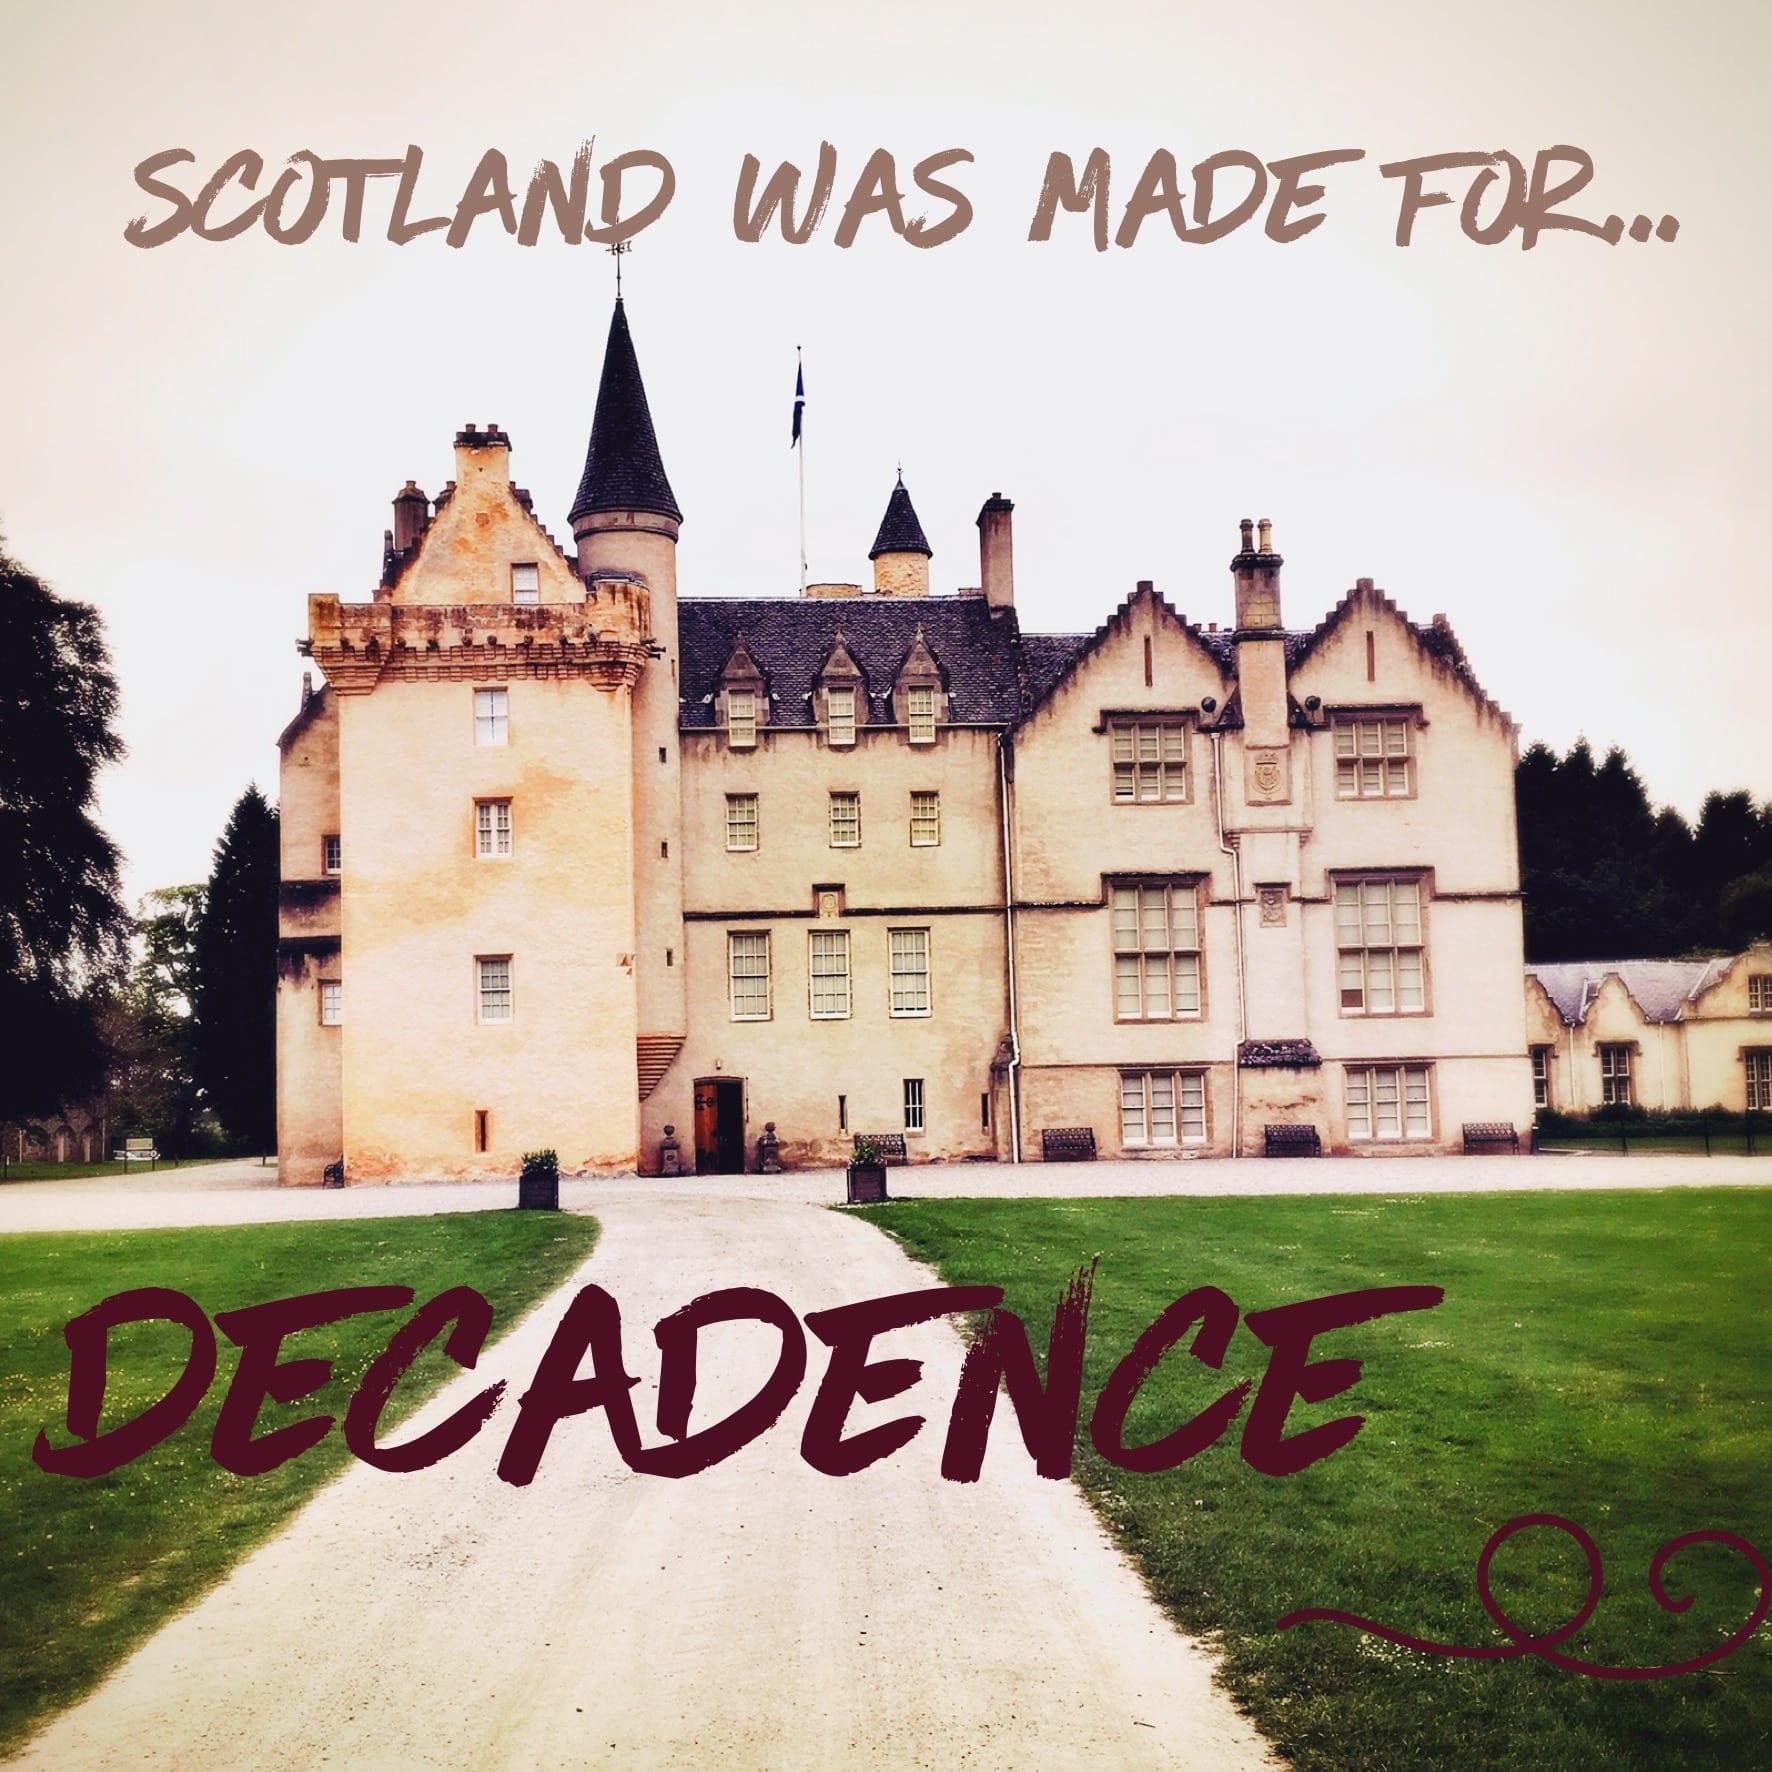 Scotland decadence